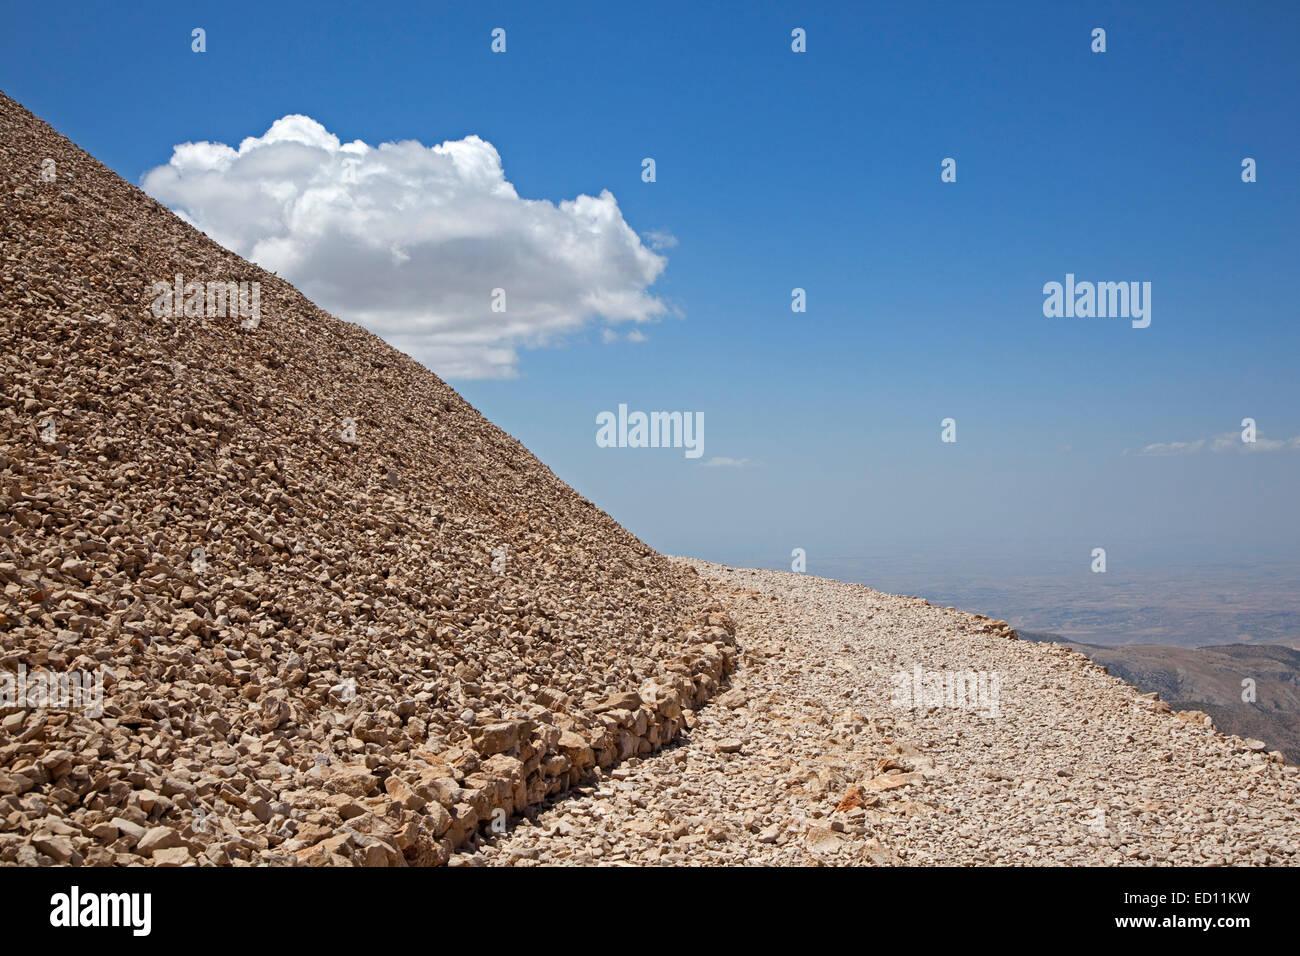 Mount Nemrut / Nemrud / Nemrut Dagi, royal tomb from the 1st century BC in Adıyaman, southeastern Turkey - Stock Image